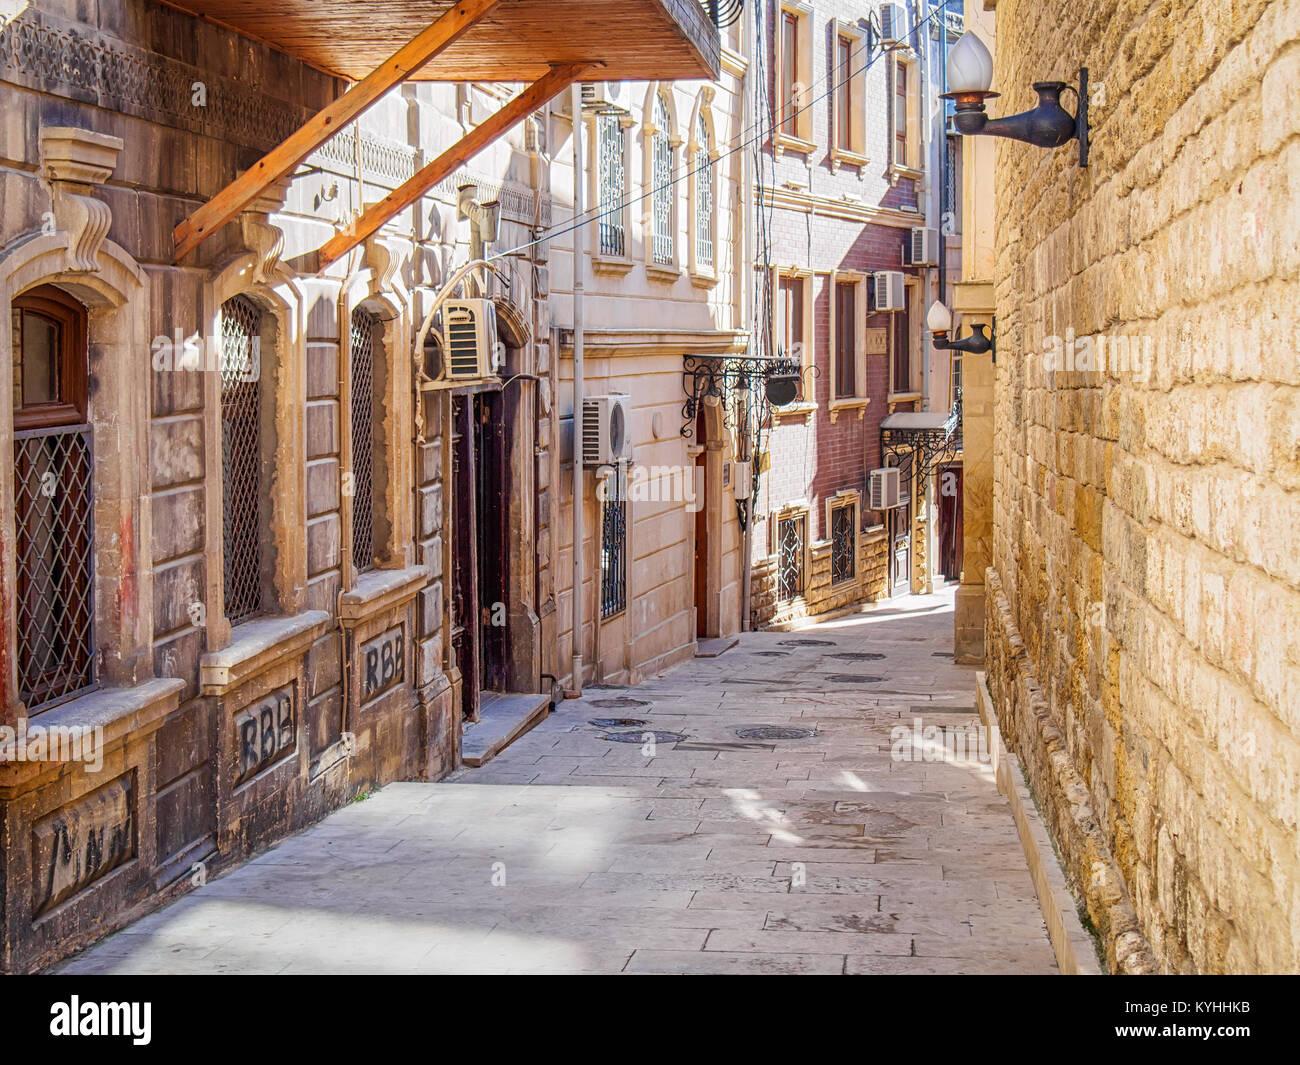 Street in Baku old town - Stock Image